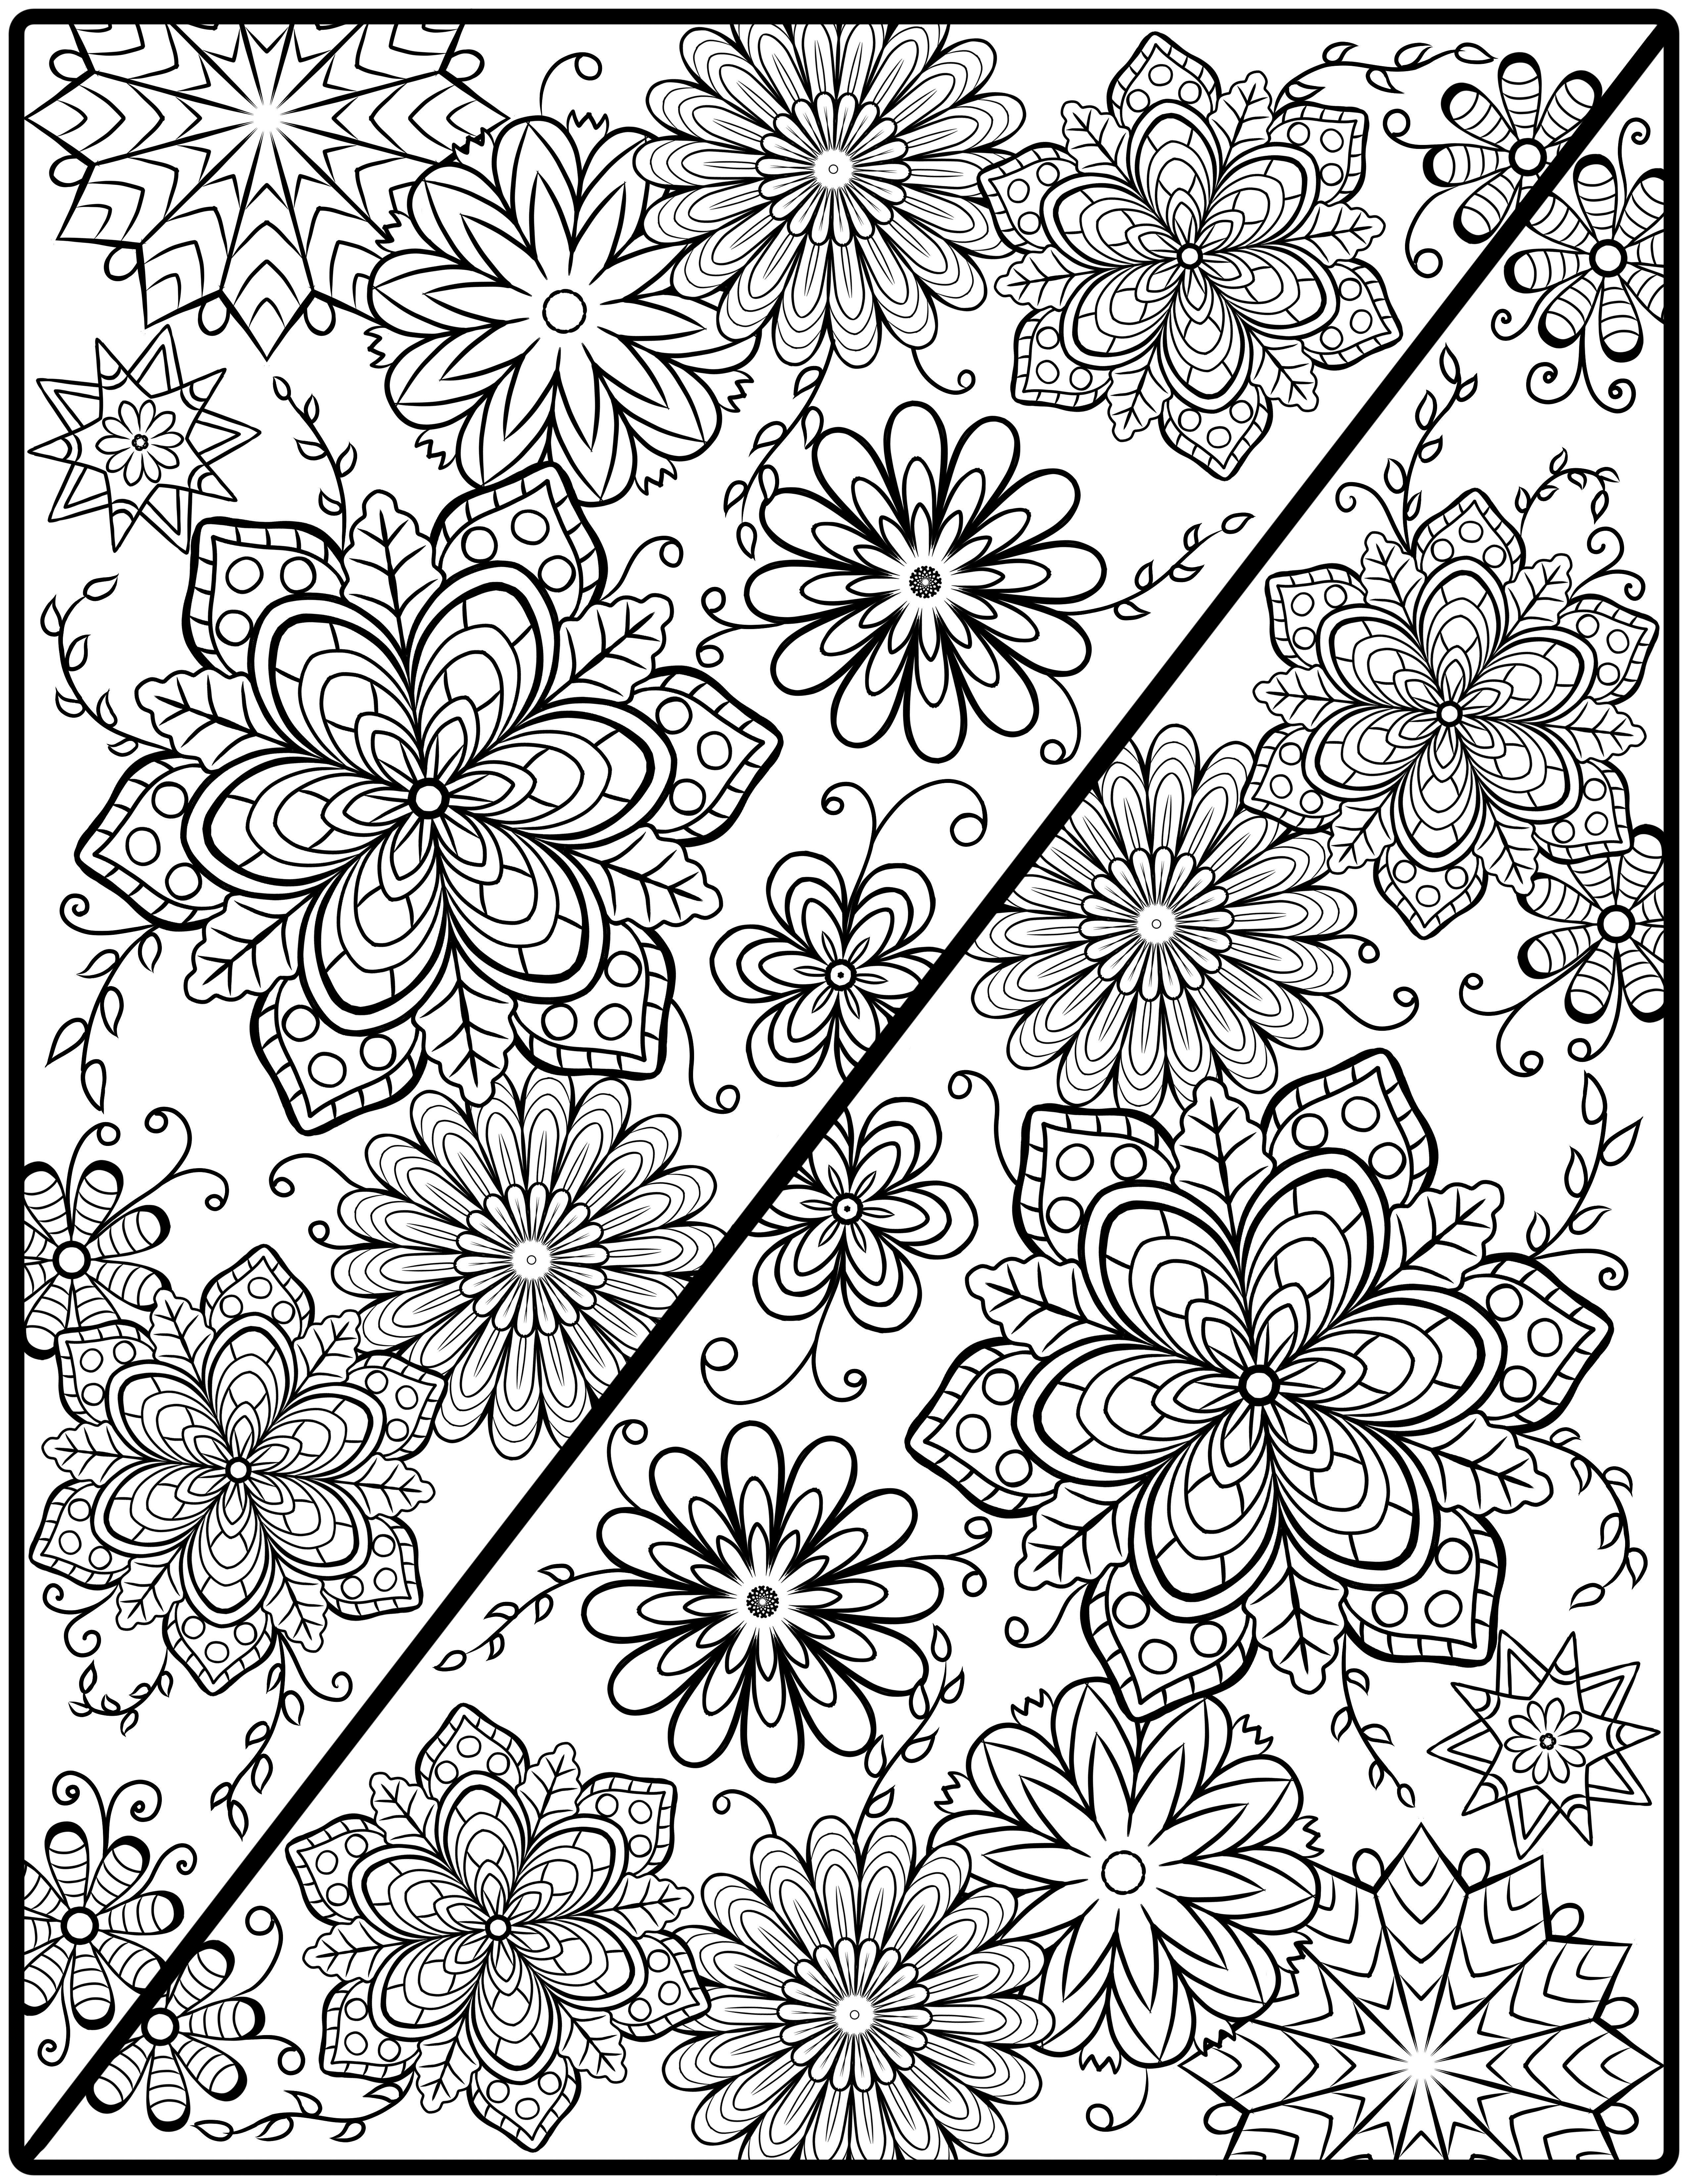 Mandala Colouring Page Diagonal Symmetry